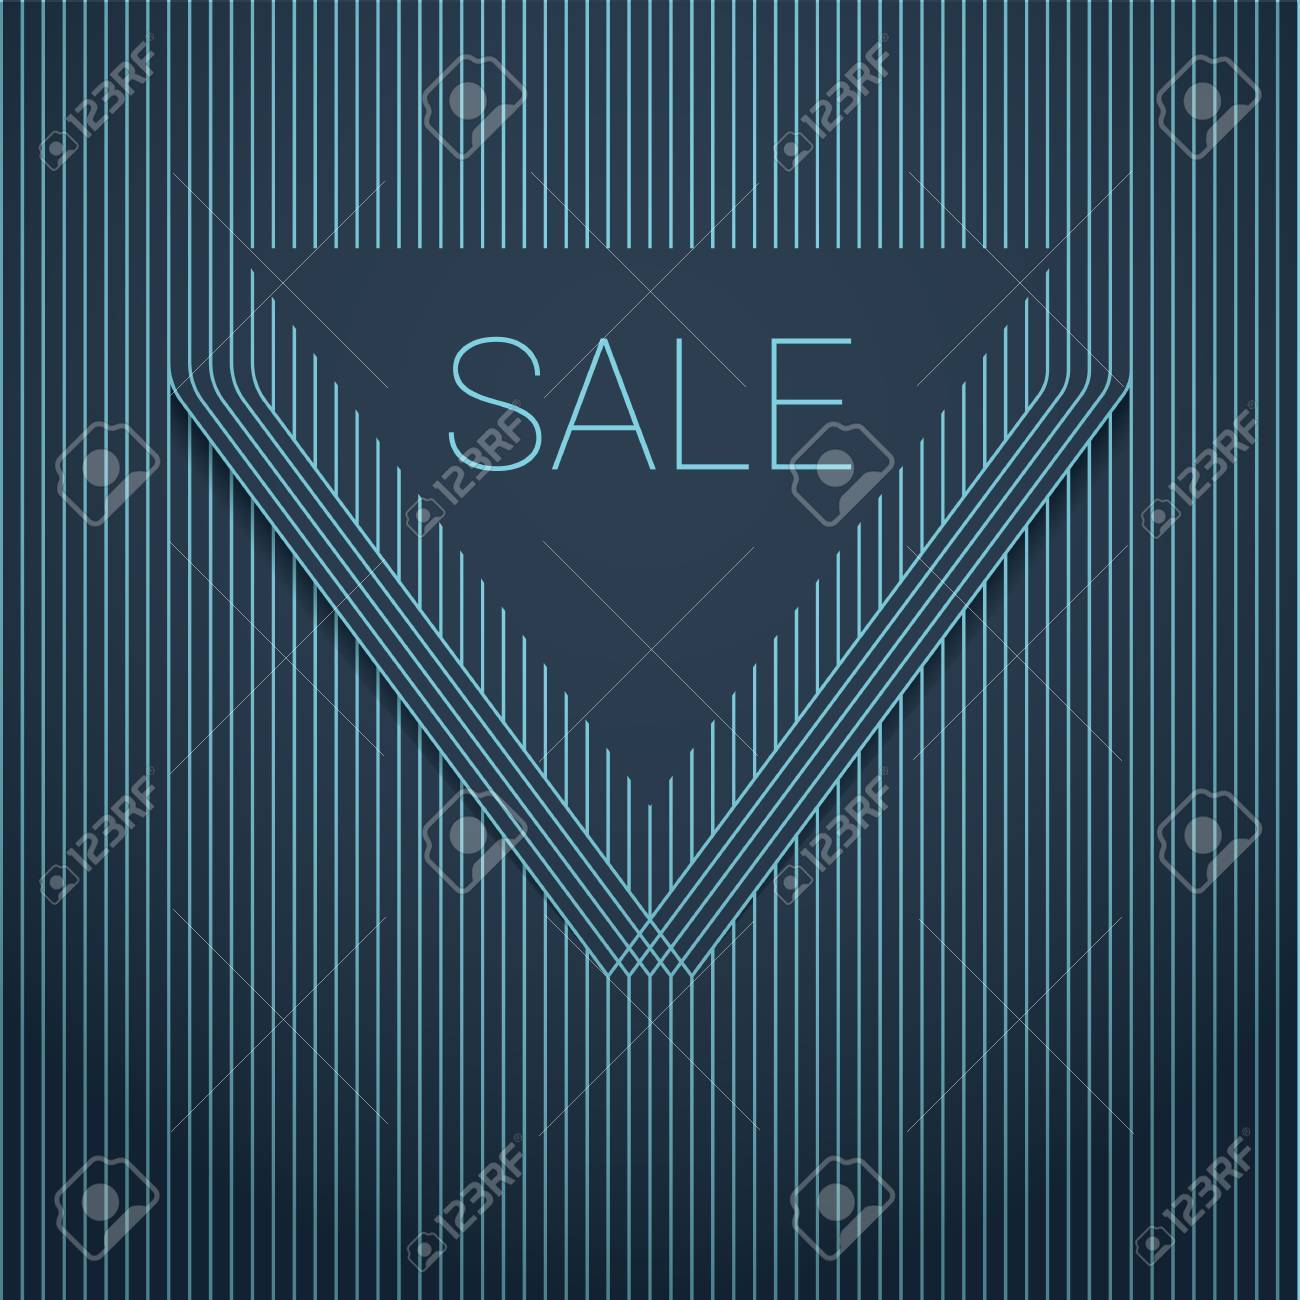 Poster design using 3d objects - Poster Design Using 3d Objects Sales Poster Design Elegant Luxurious Background Stripes Weave Pattern 3d Download